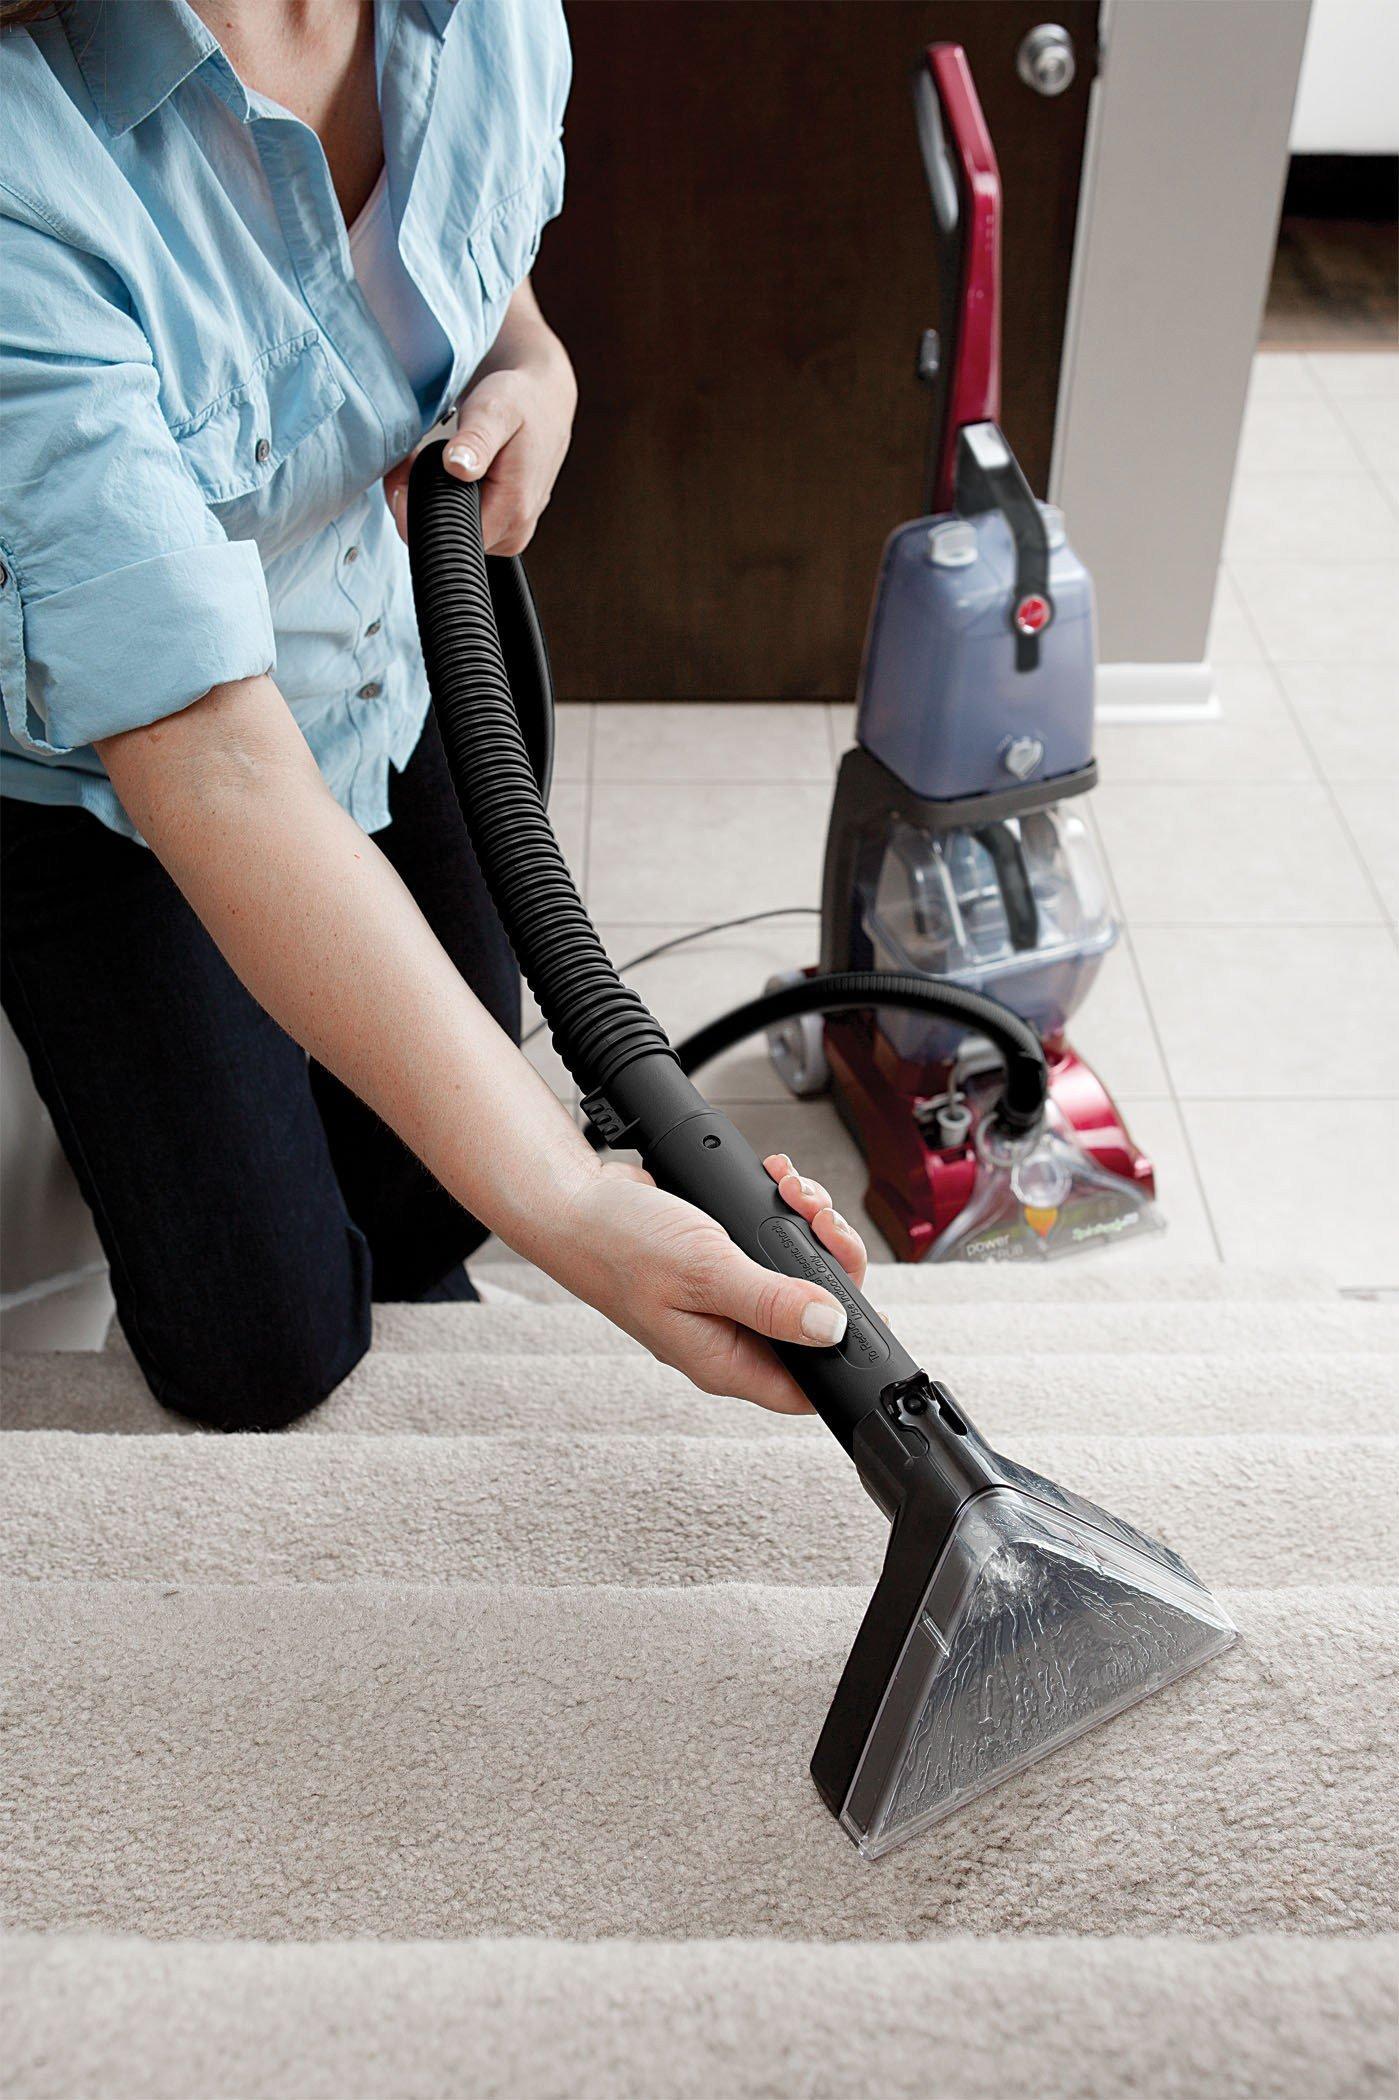 Power Scrub Deluxe Carpet Cleaner5